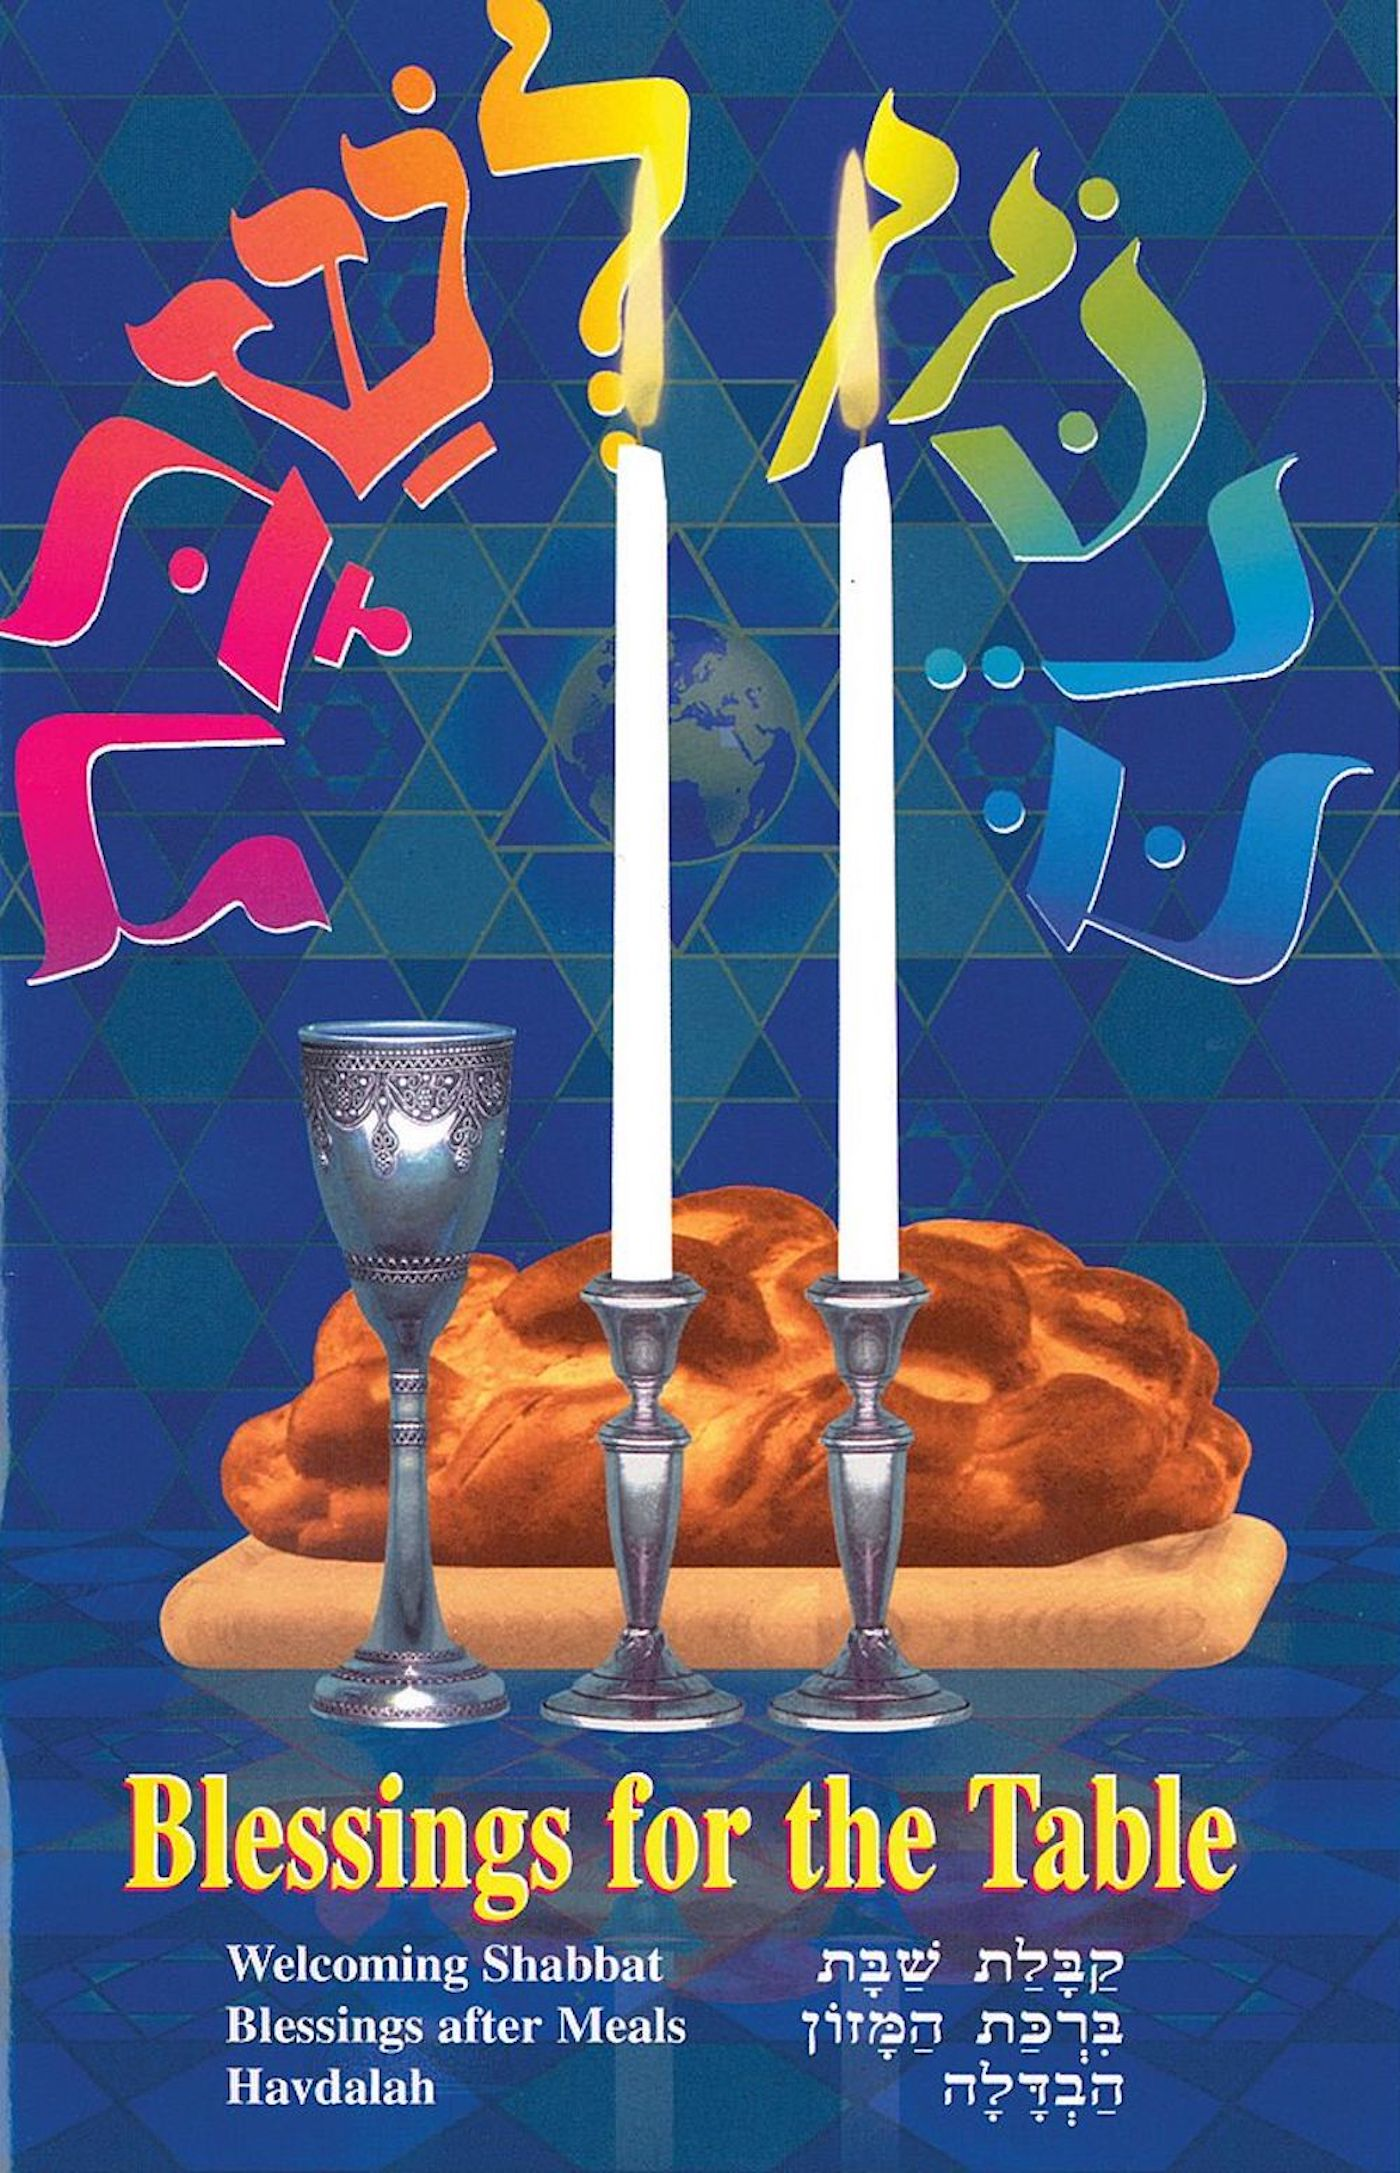 Blessings for the Table - Birkon L'Shabbat